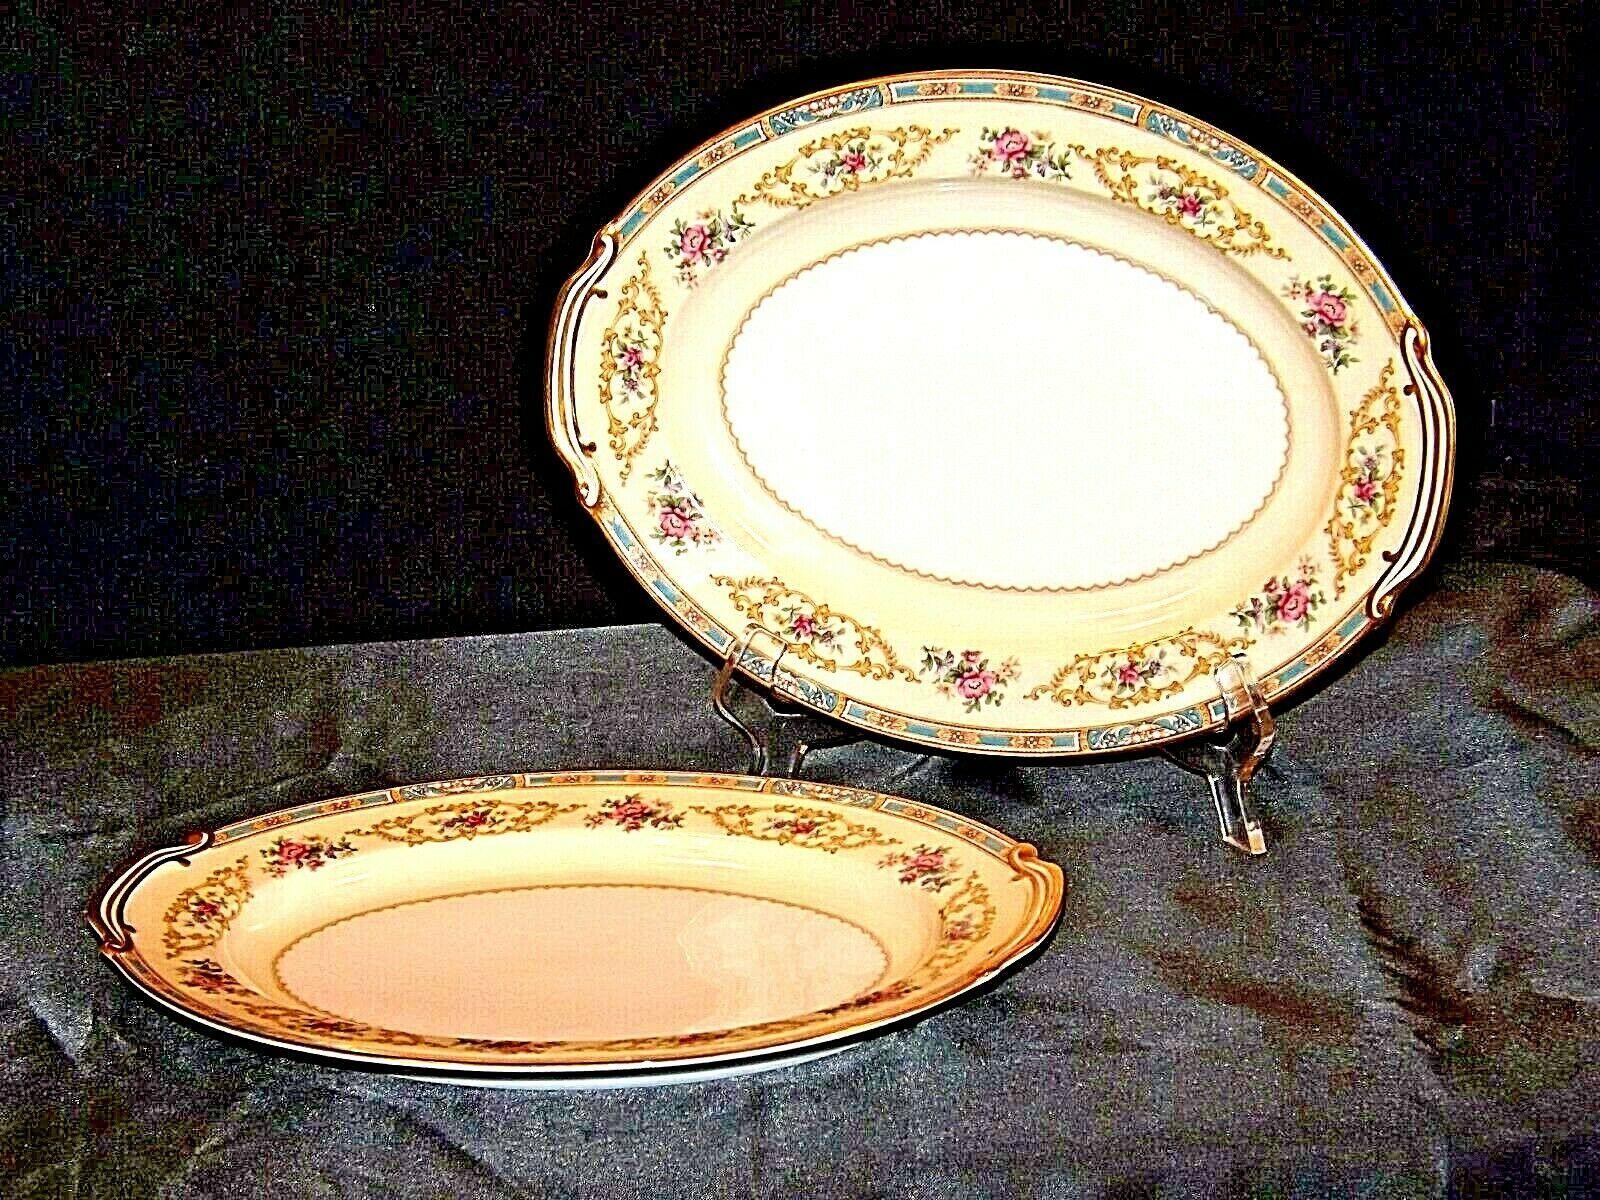 Noritake China Japan (Colby Pattern # 5032) serving platters AA19-1490 Vintage